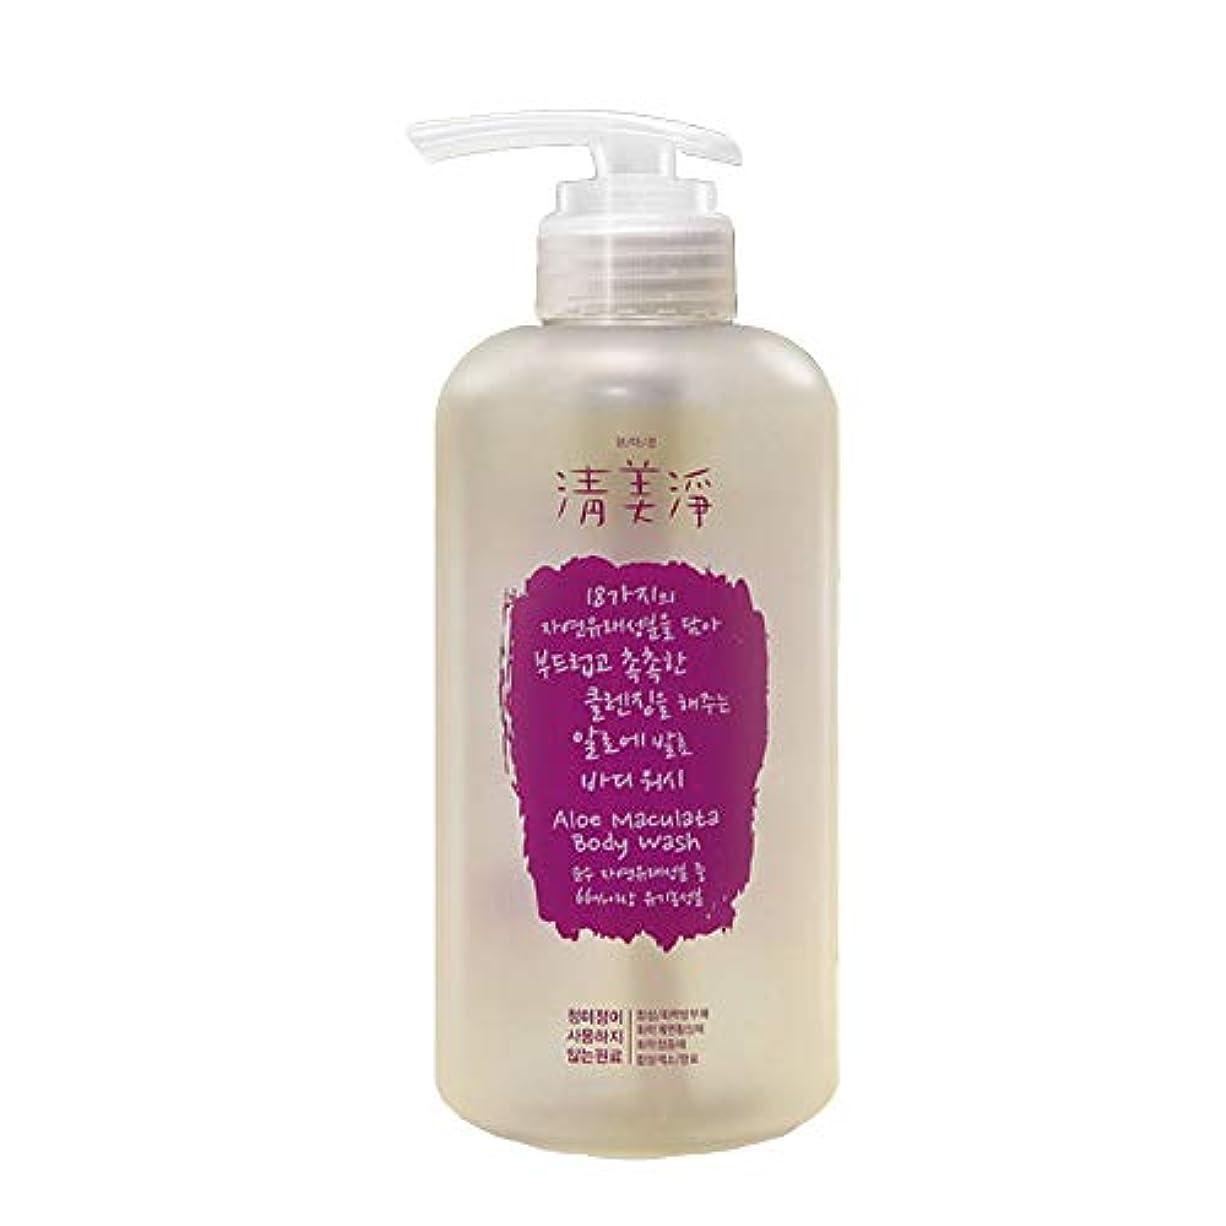 [ChungMiJung] 清美浄(チョンミジョン) アロエ発酵ボディウォッシュ 500ml Aloe Maculata Body Wash - Organic Body Wash with 18 Ingredients...